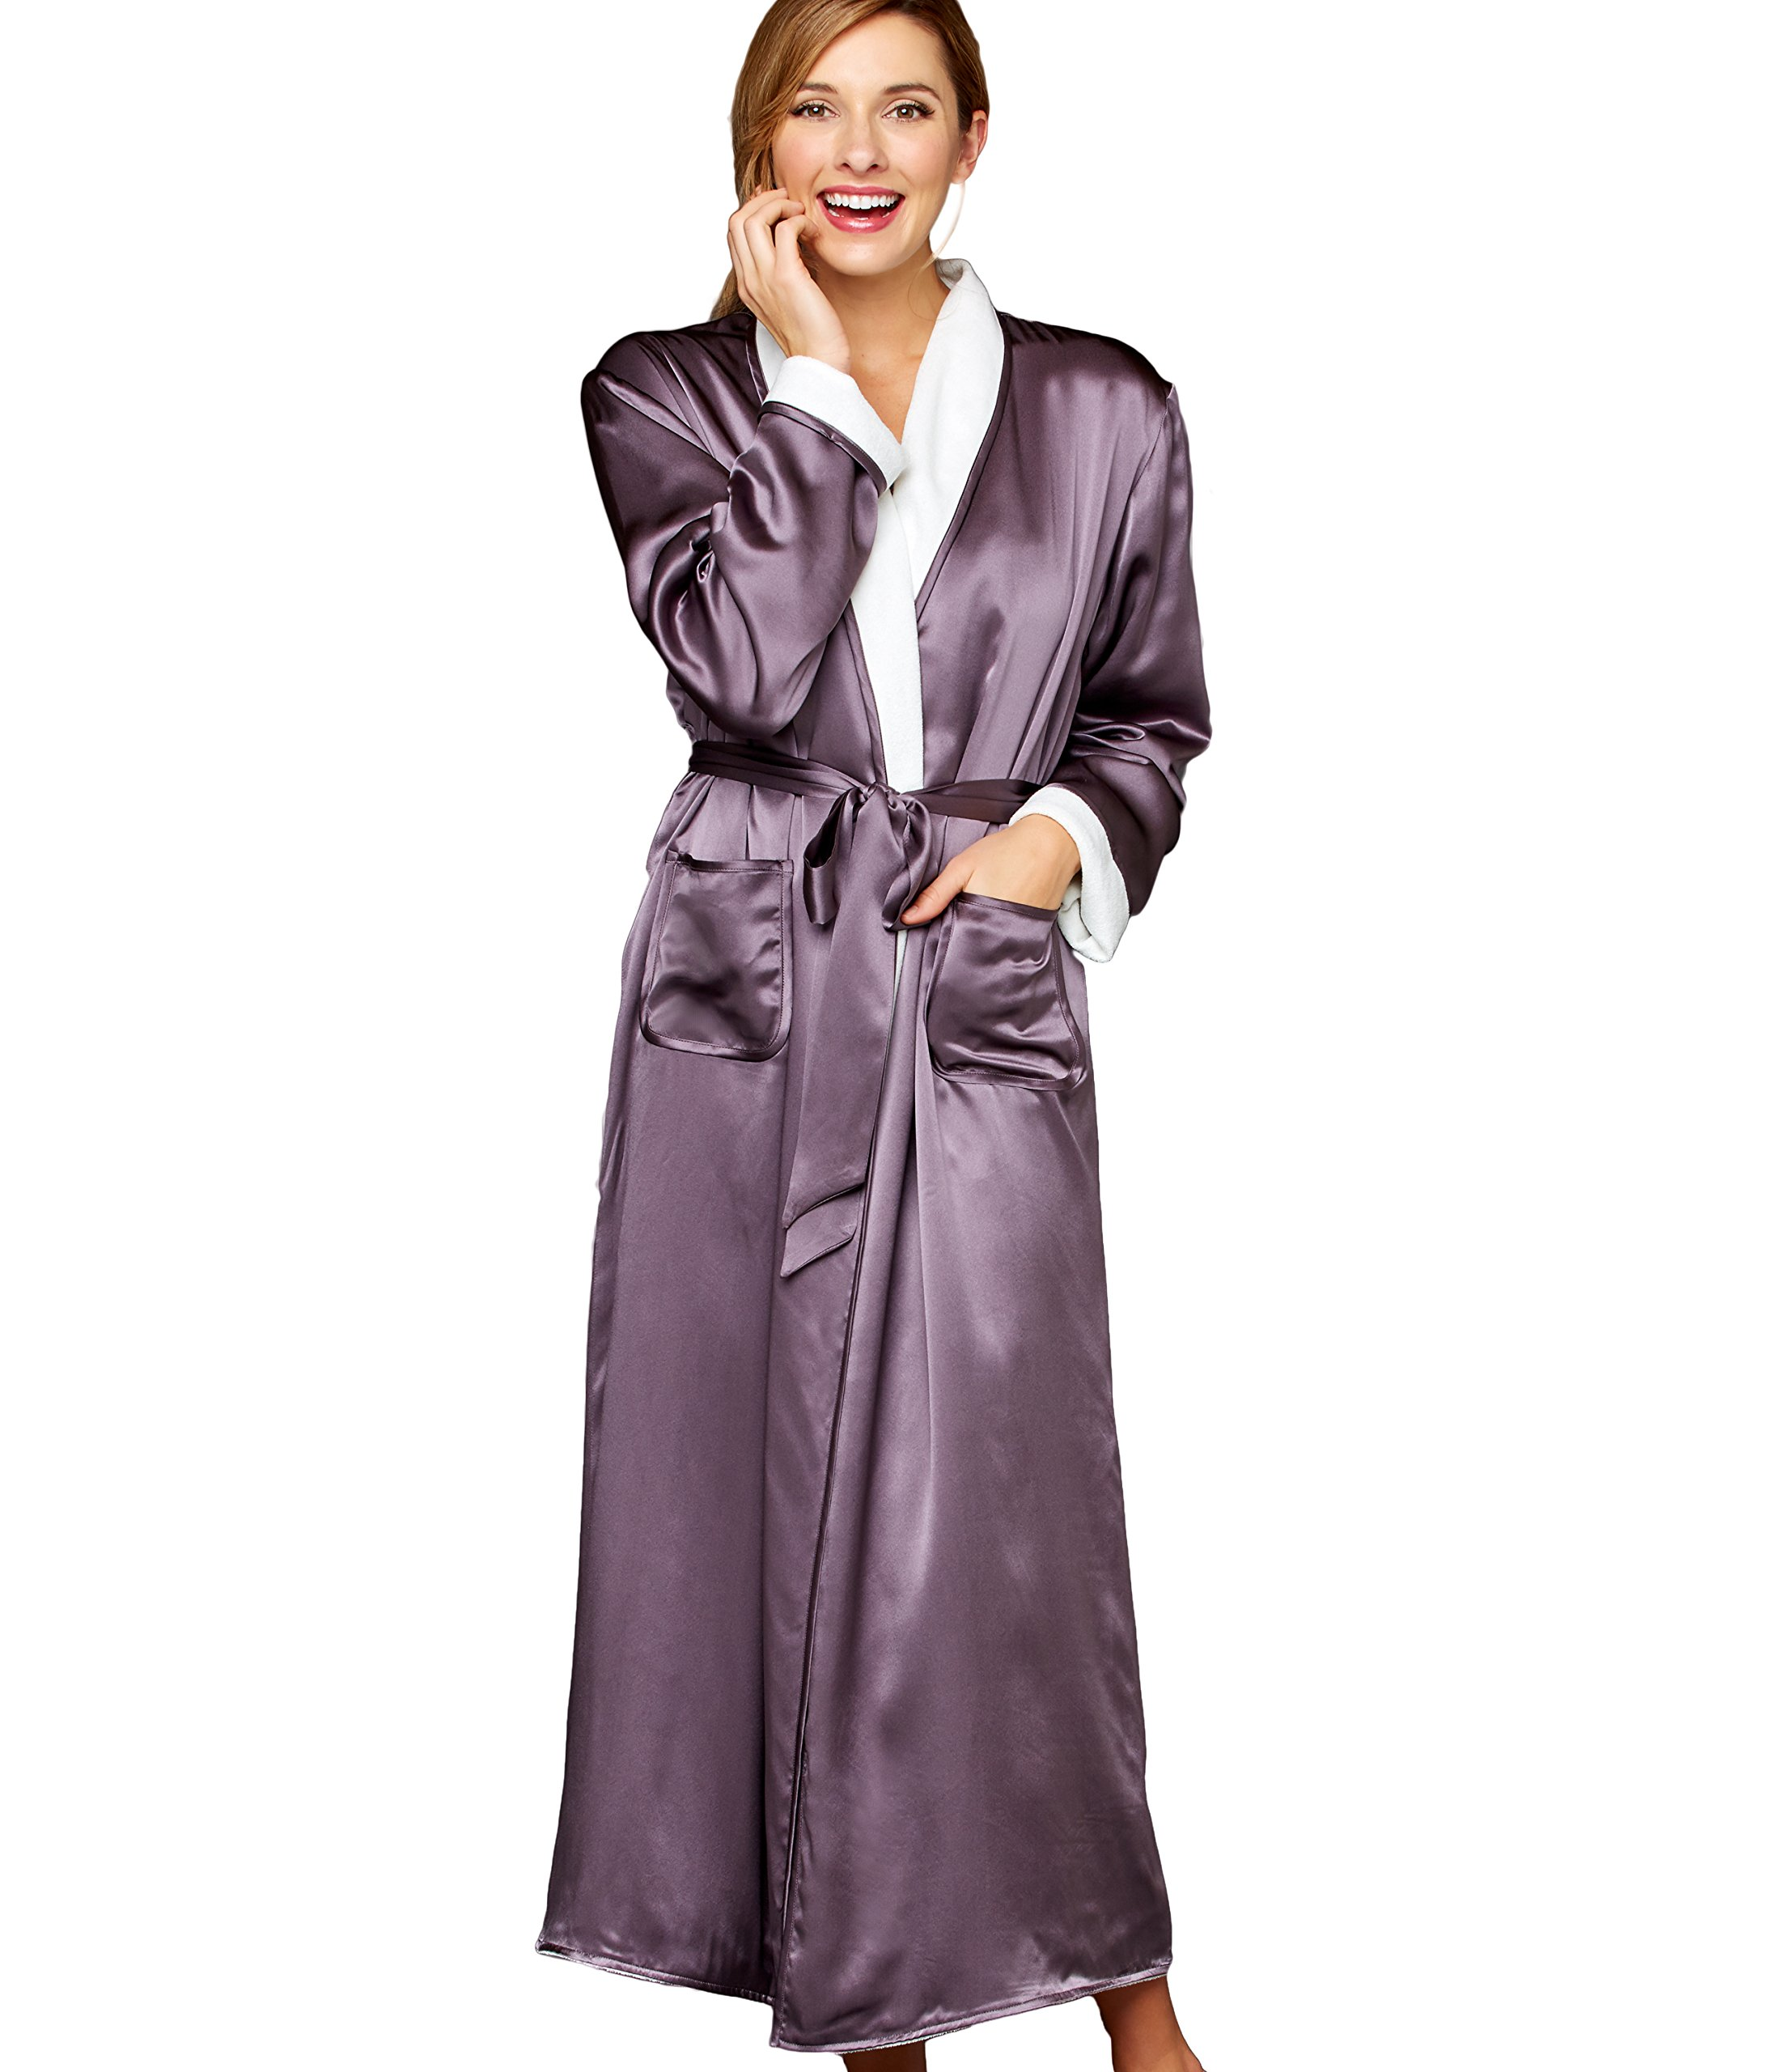 Julianna Rae Women's 100% Silk, Il Cieli Spa Robe, Tanzanite, L/XL